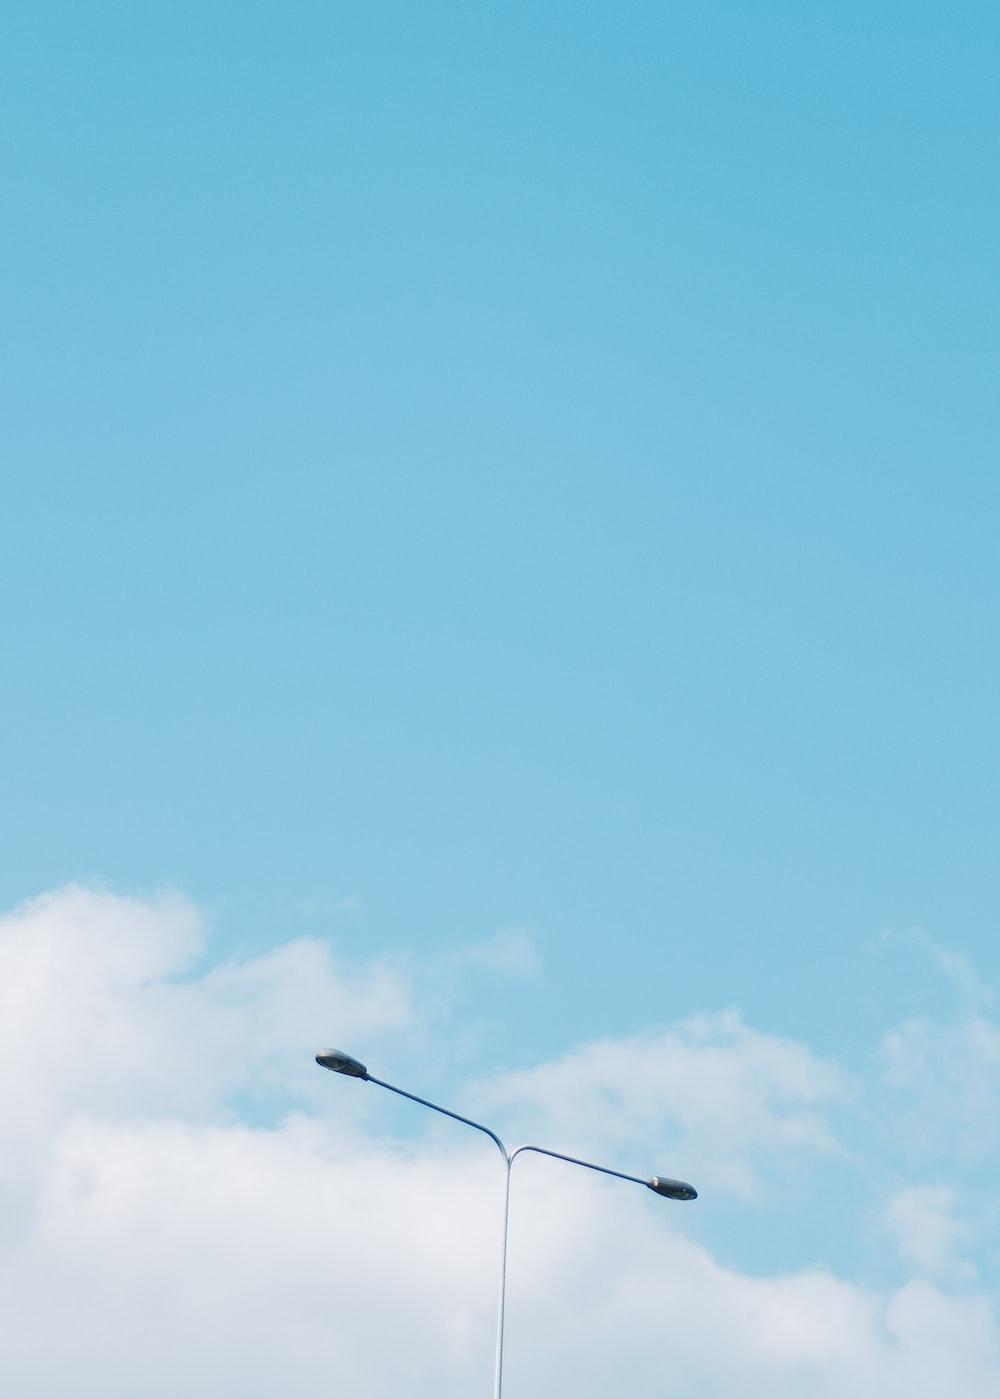 gray street lamp across blue sky